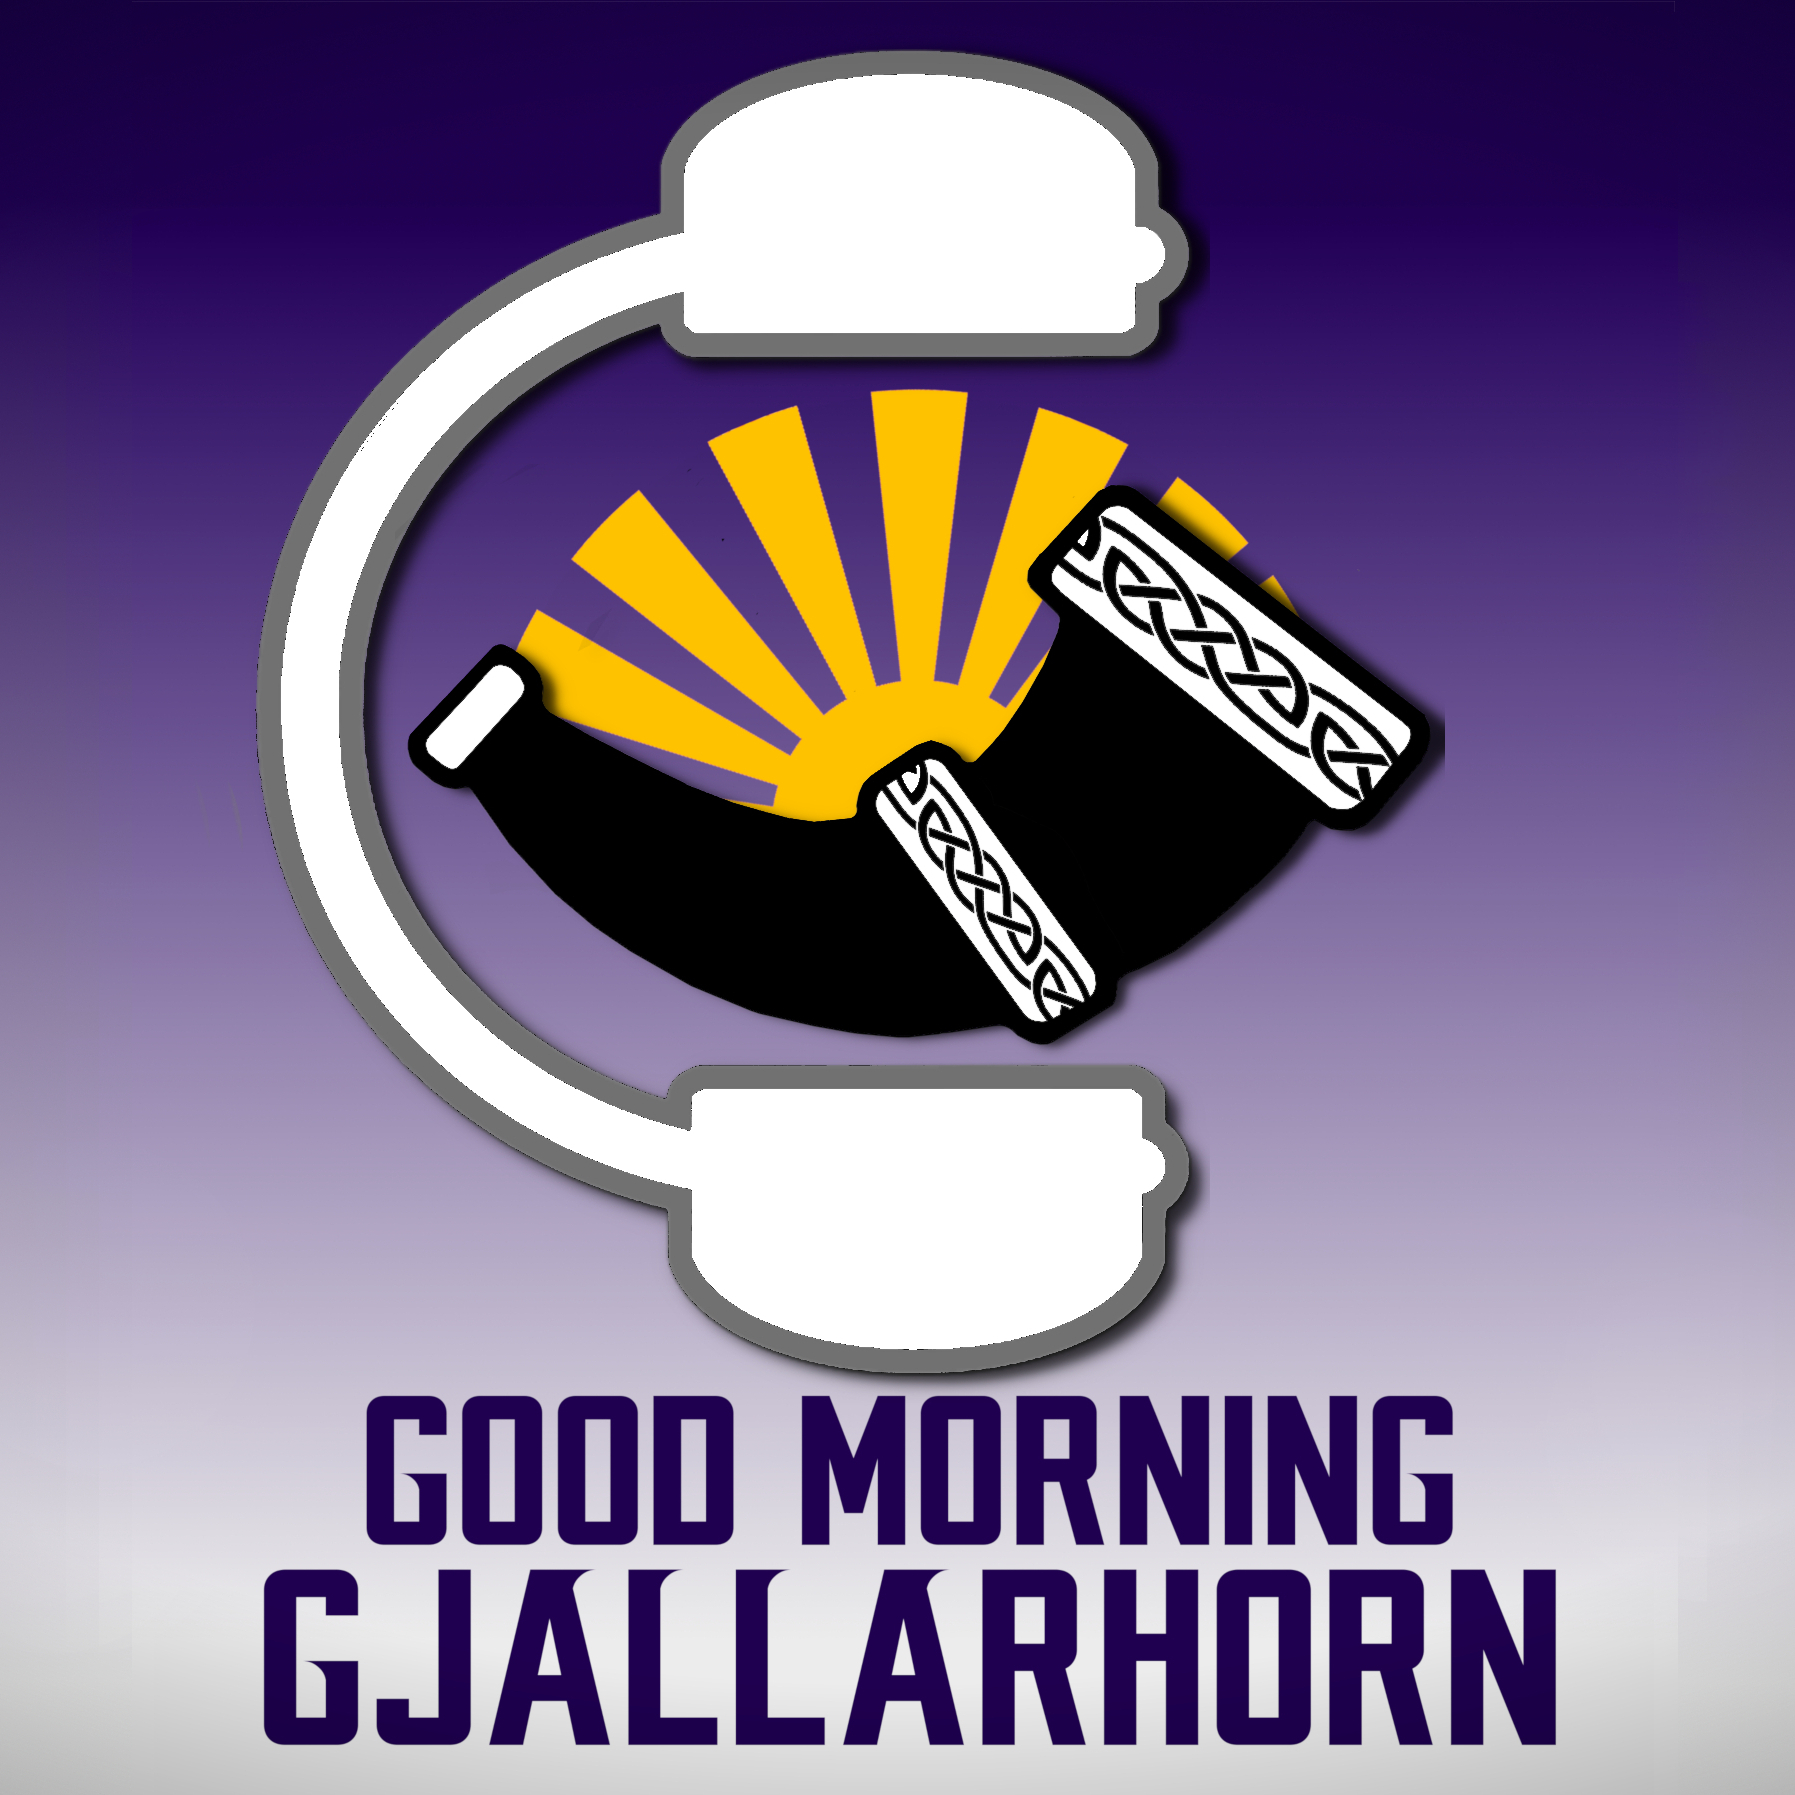 Good Morning Gjallarhorn